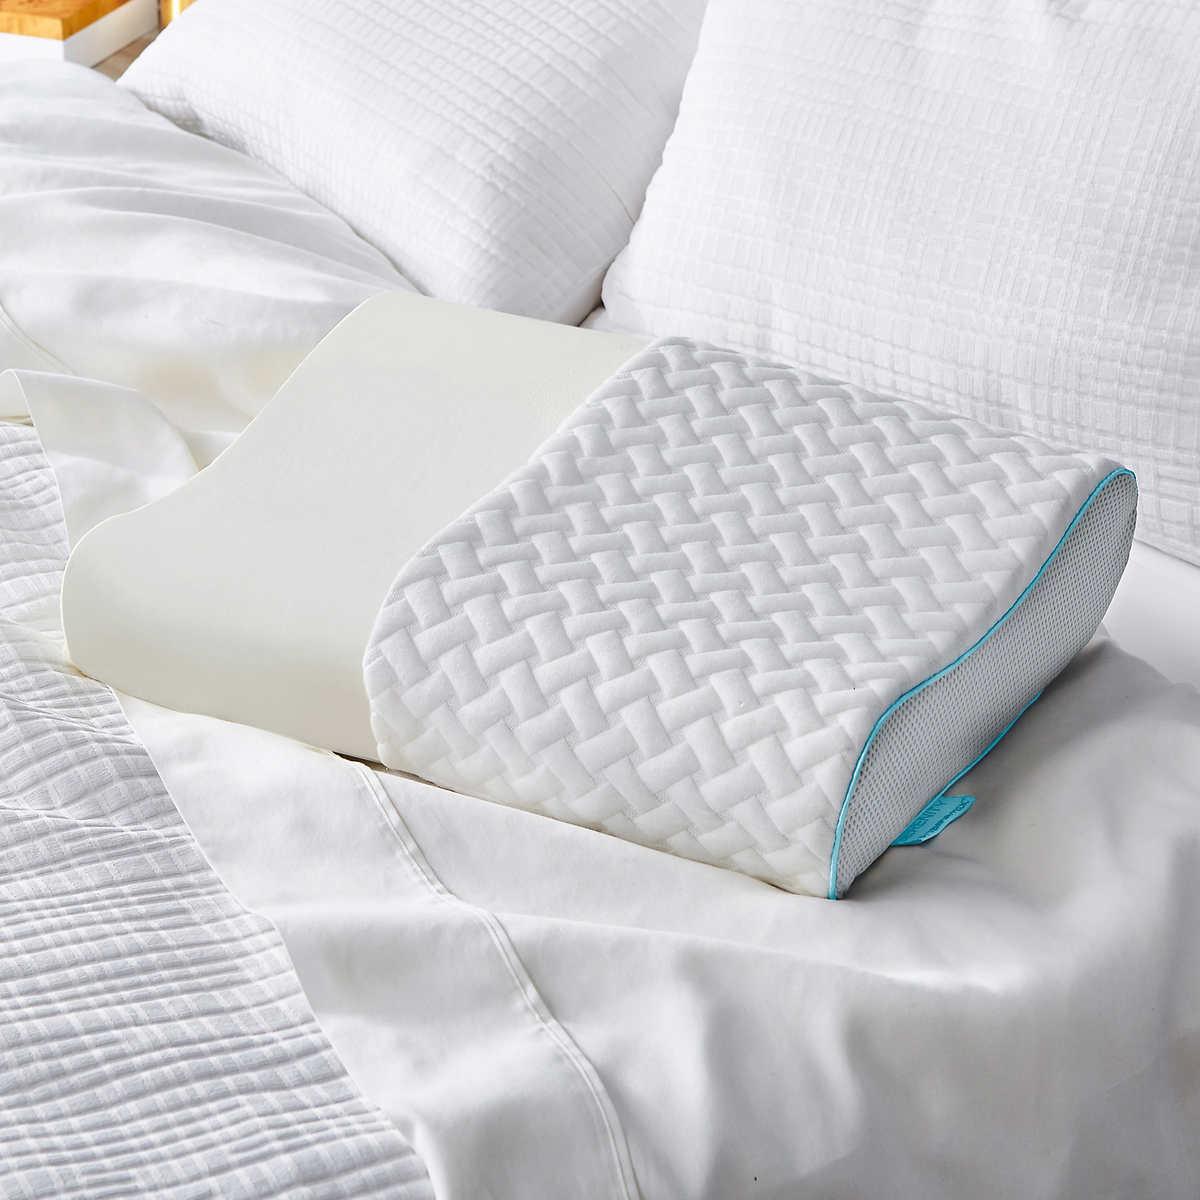 best service ece08 8776b Details about Serenity by Tempur-Pedic Contour Memory Foam Pillow Machine  Washable Cover